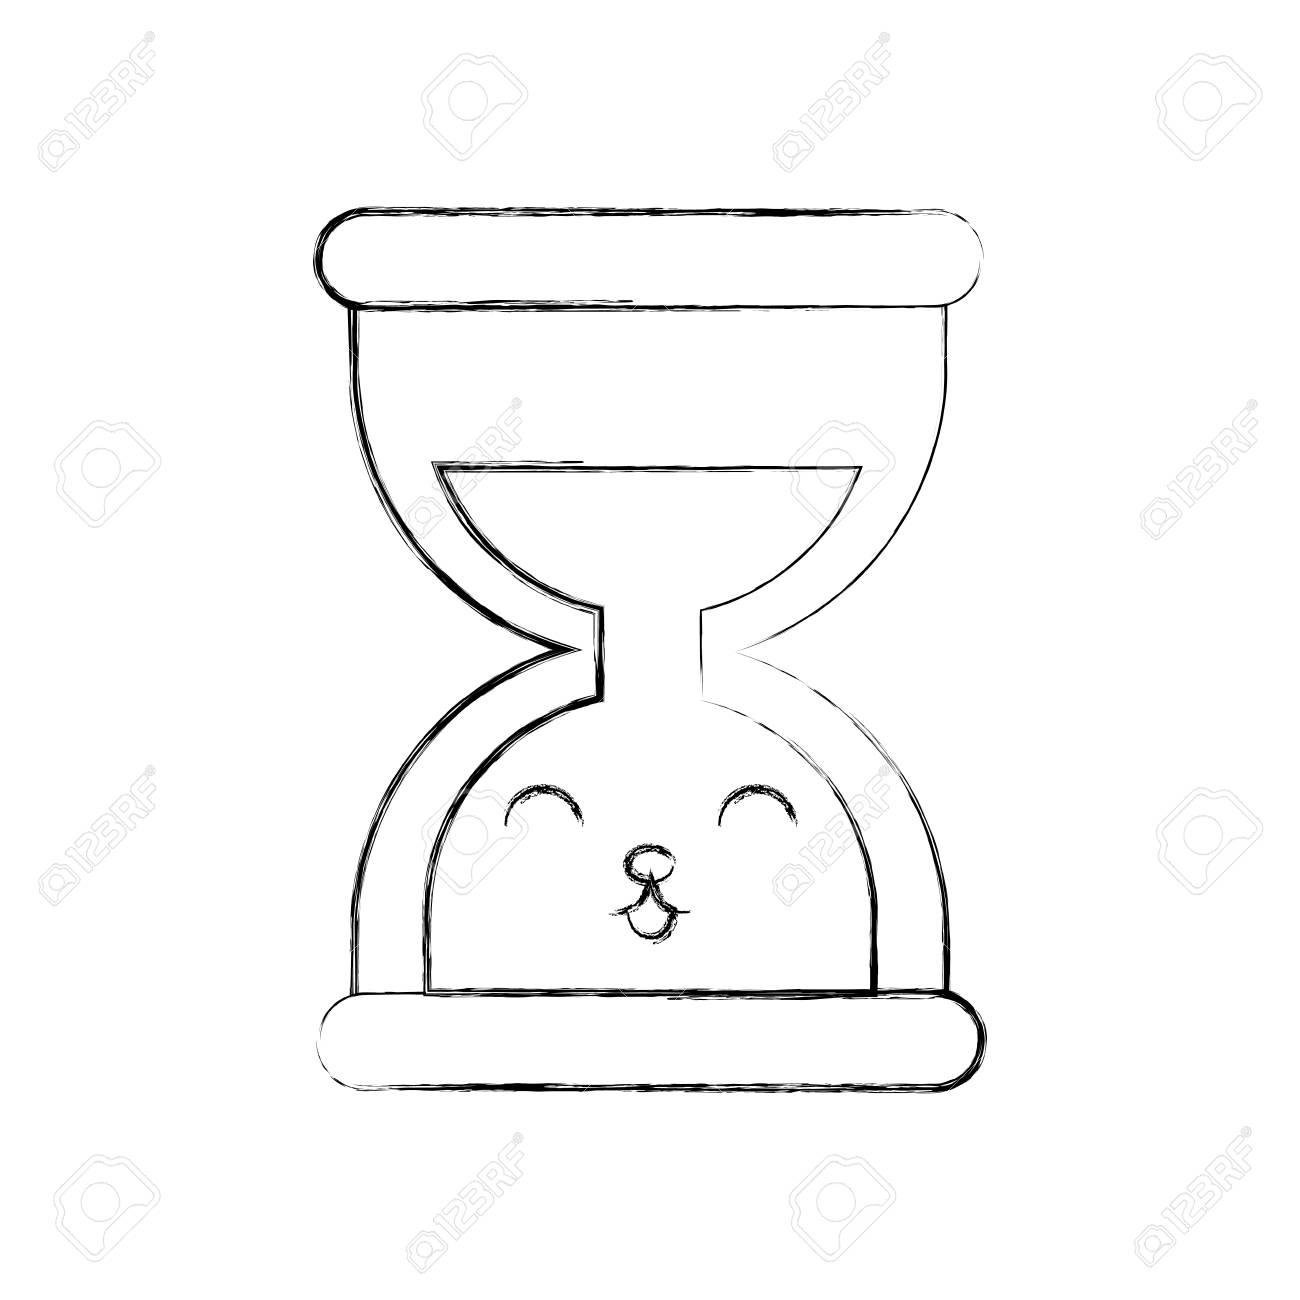 business time management hourglass cartoon vector illustration Hourglass Clip Art business time management hourglass cartoon vector illustration stock vector 86857015